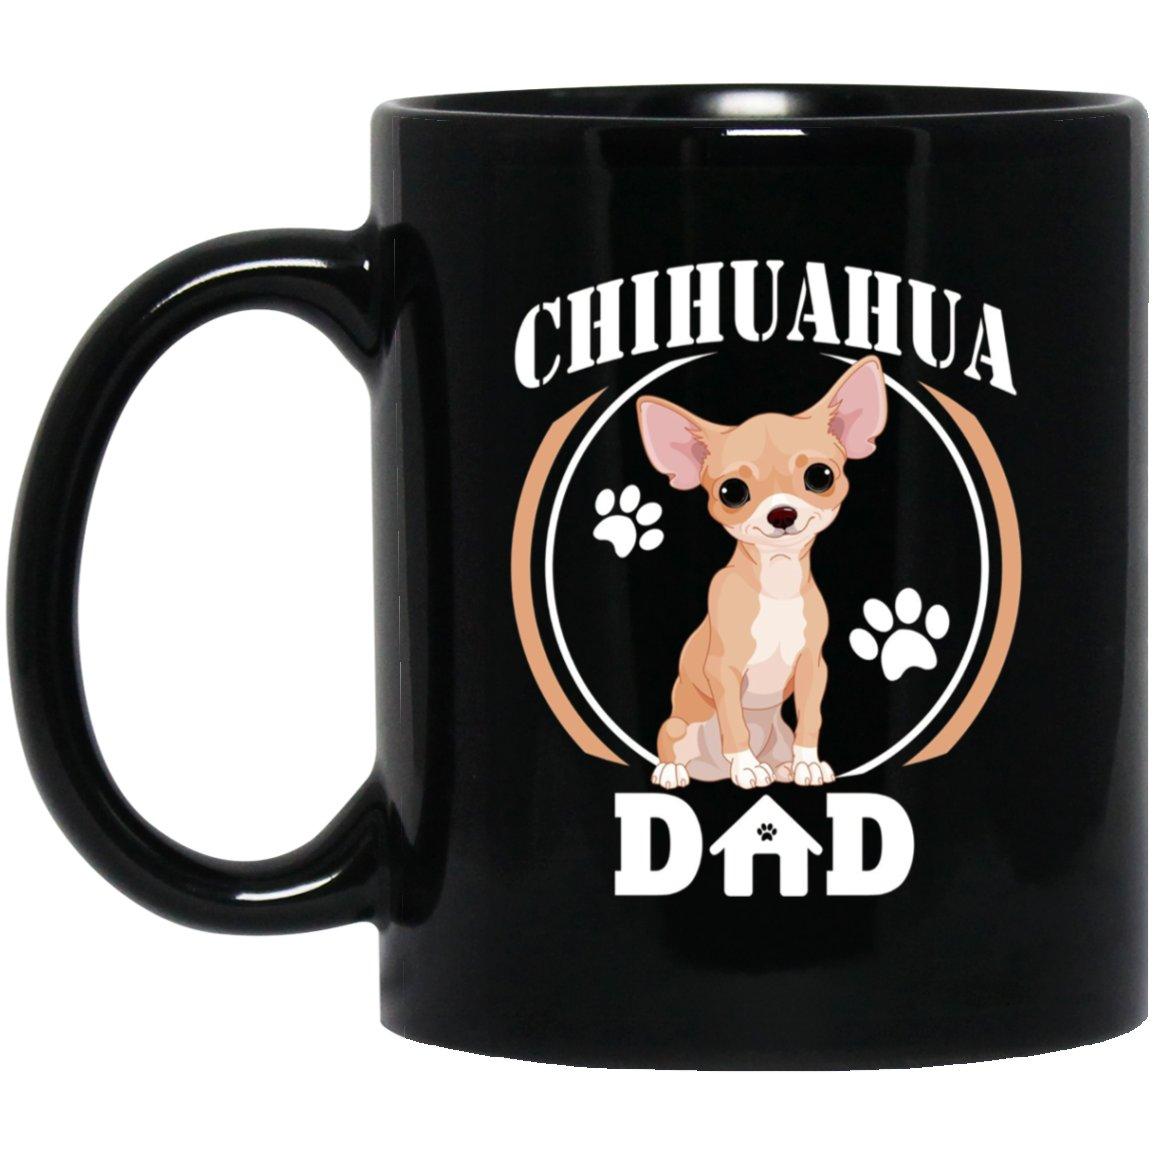 Mens Chihuahua Dad Chihuahua Gift For Fathers Day 2018 Black  Mug Black Ceramic 11oz Coffee Tea Cup